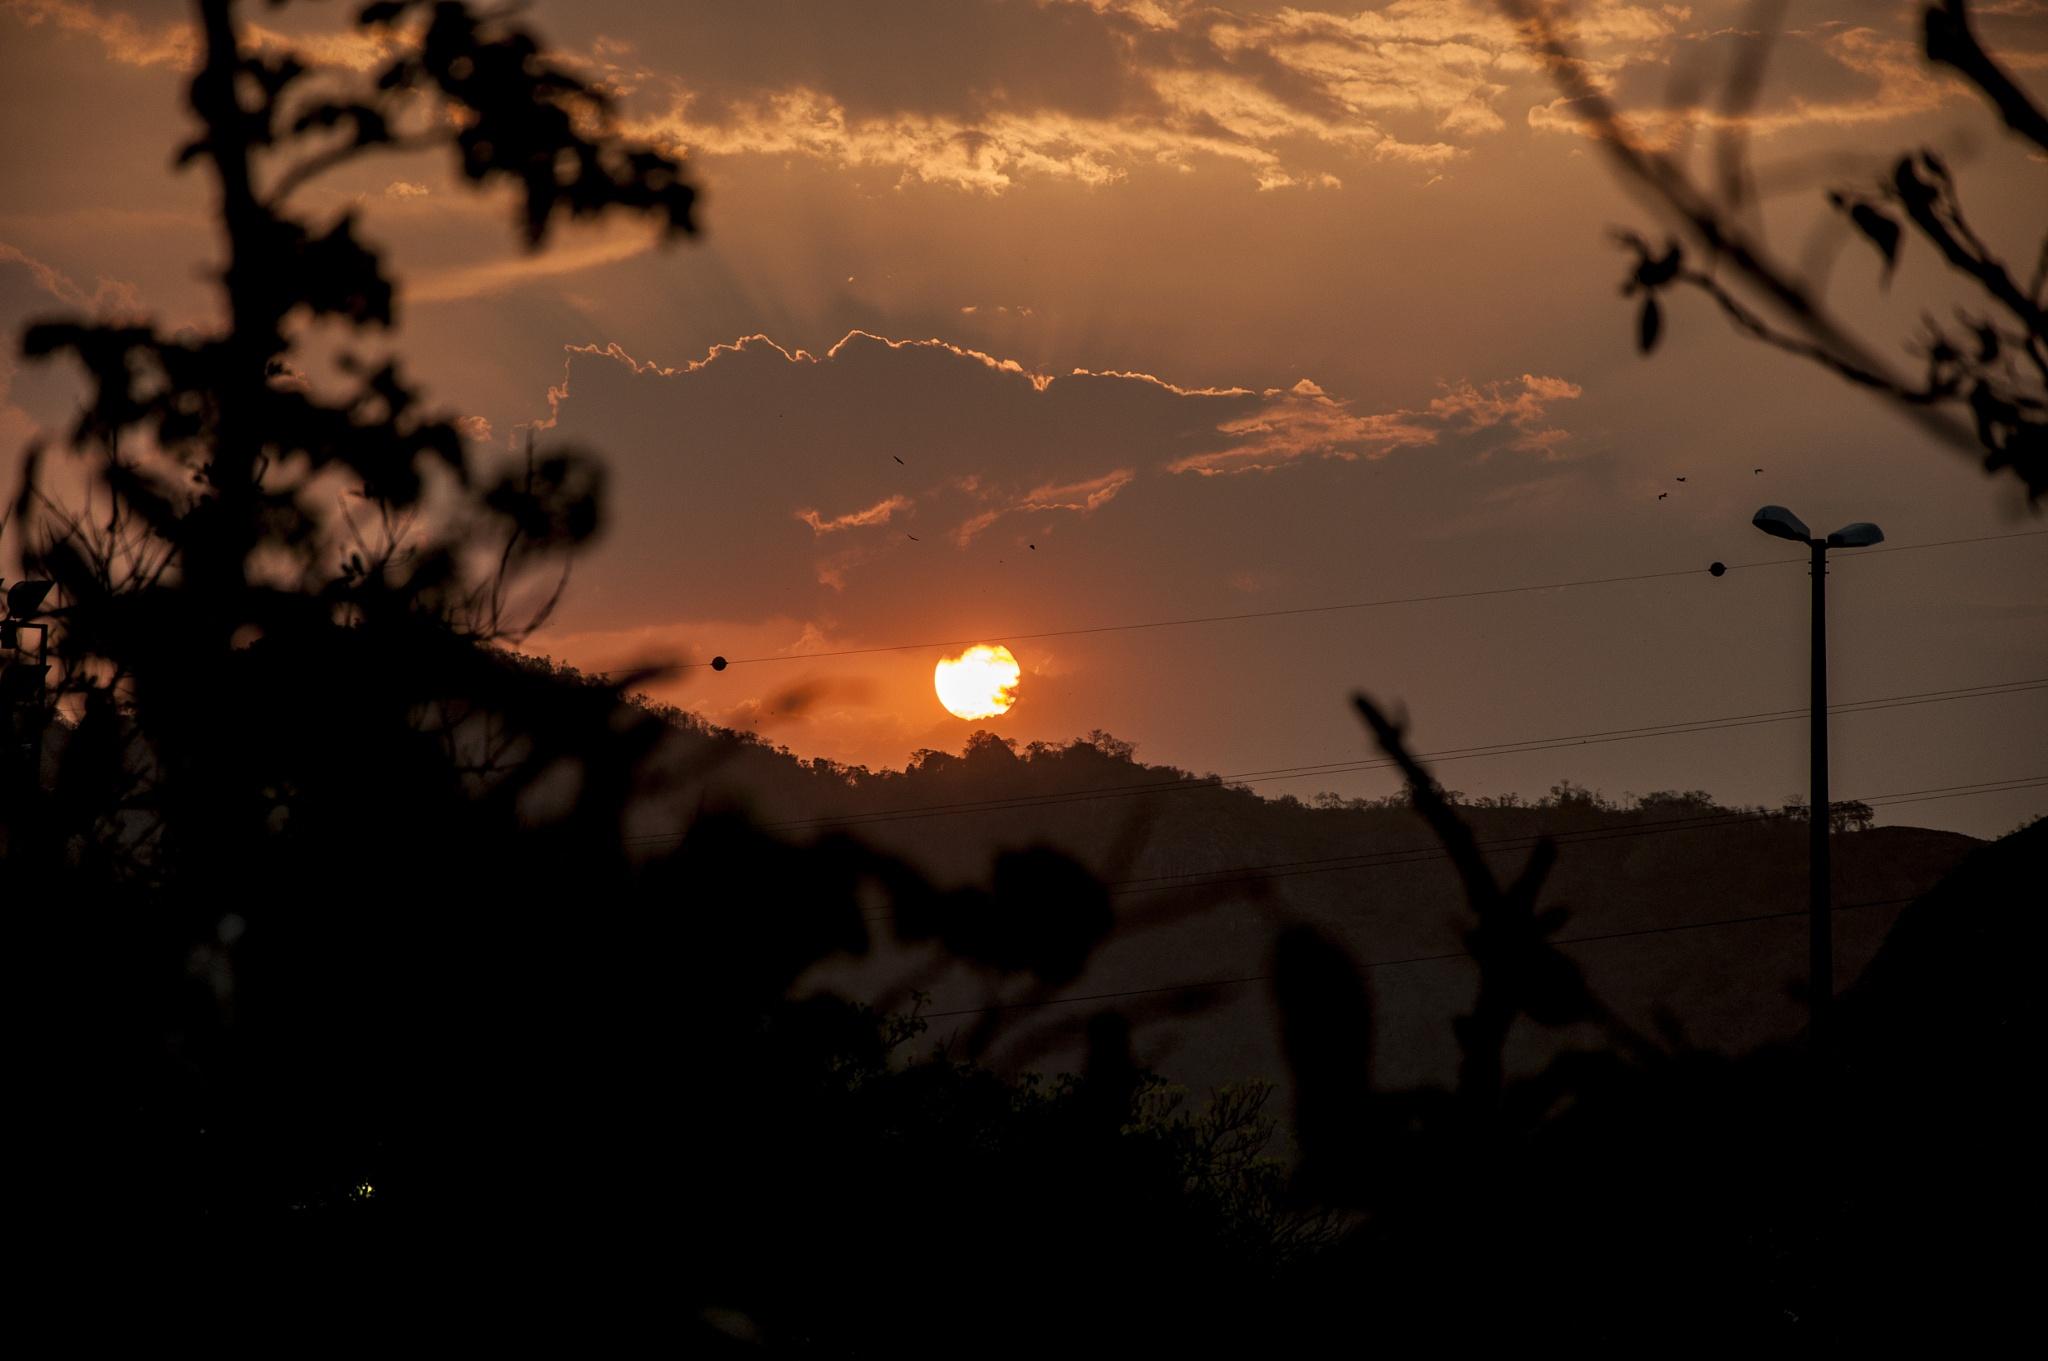 sunset in Vitória by Alexandre Ricardo